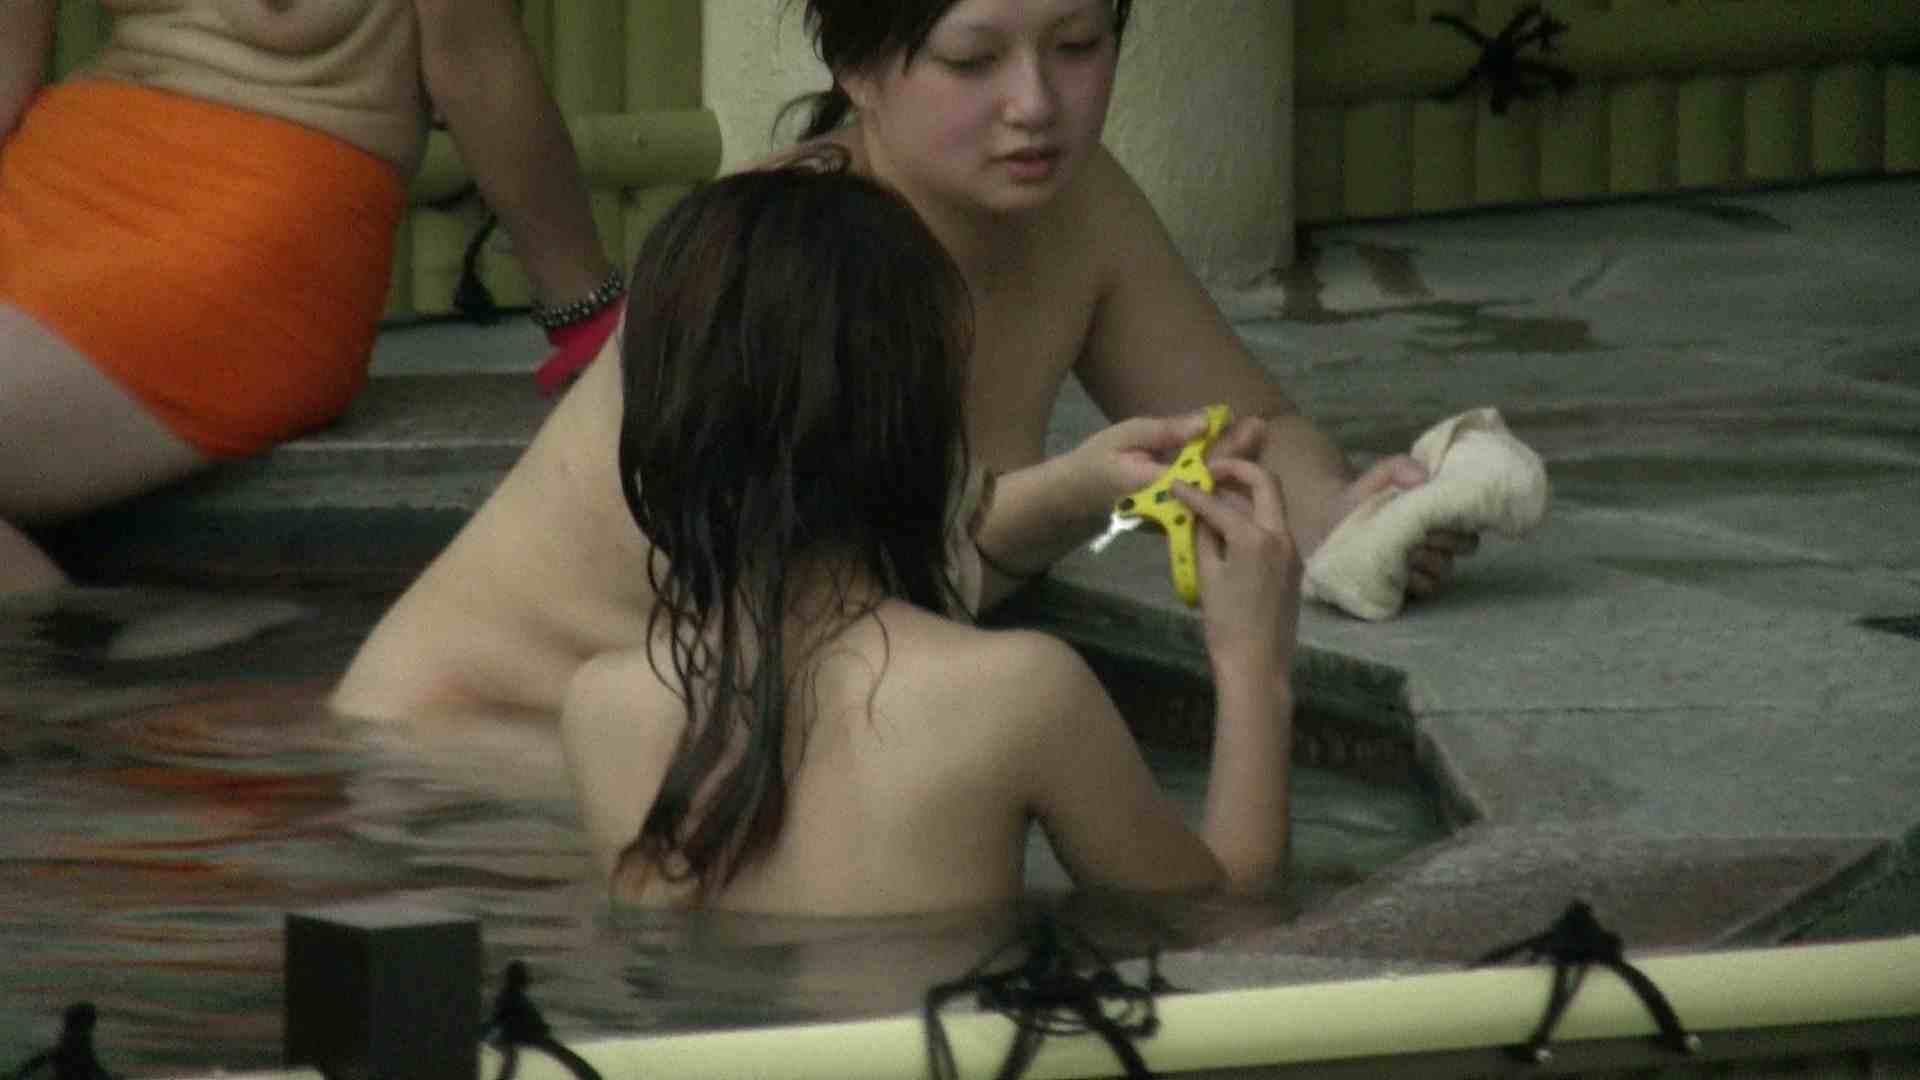 Aquaな露天風呂Vol.184 OLセックス | 盗撮  81画像 16